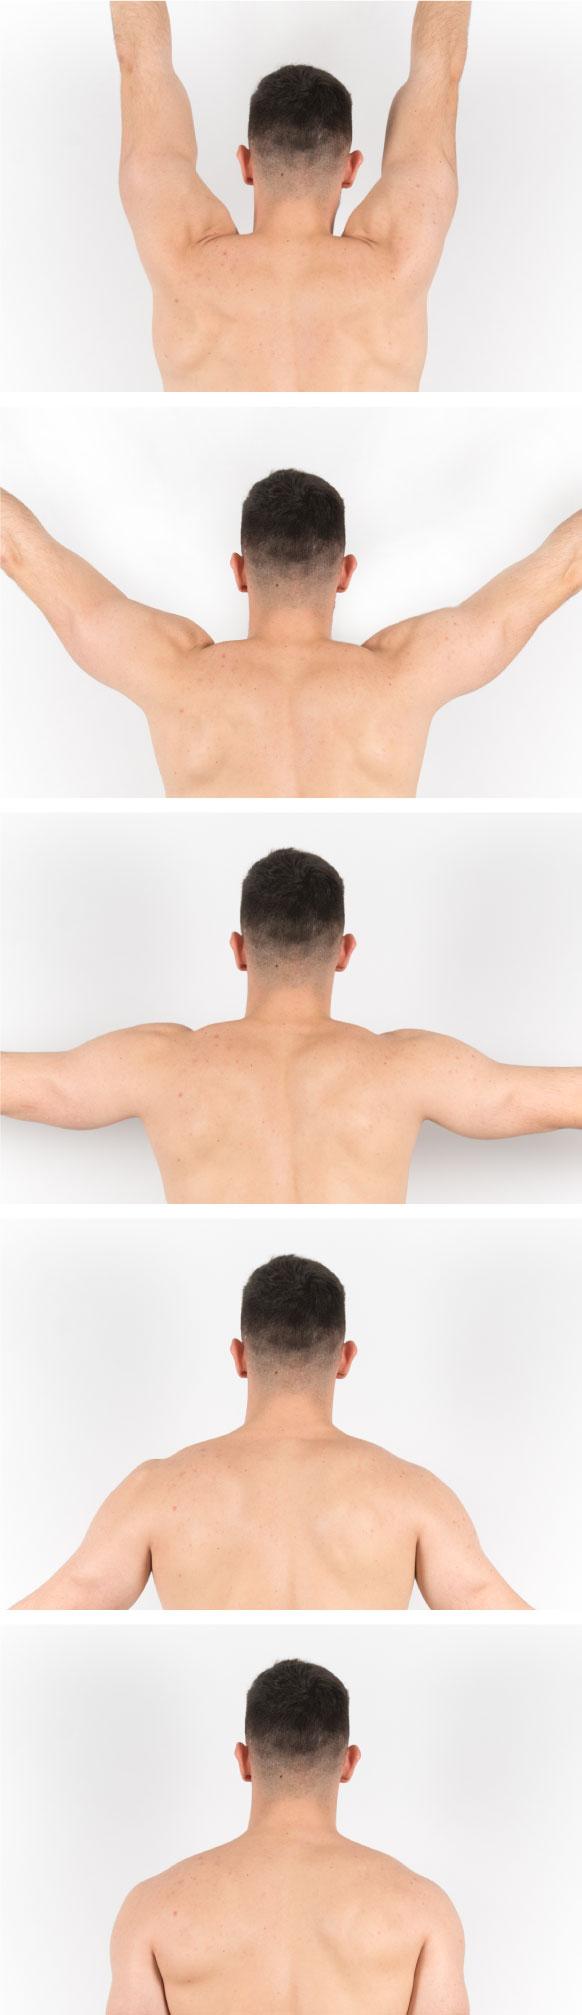 Espalda, medicina deportiva